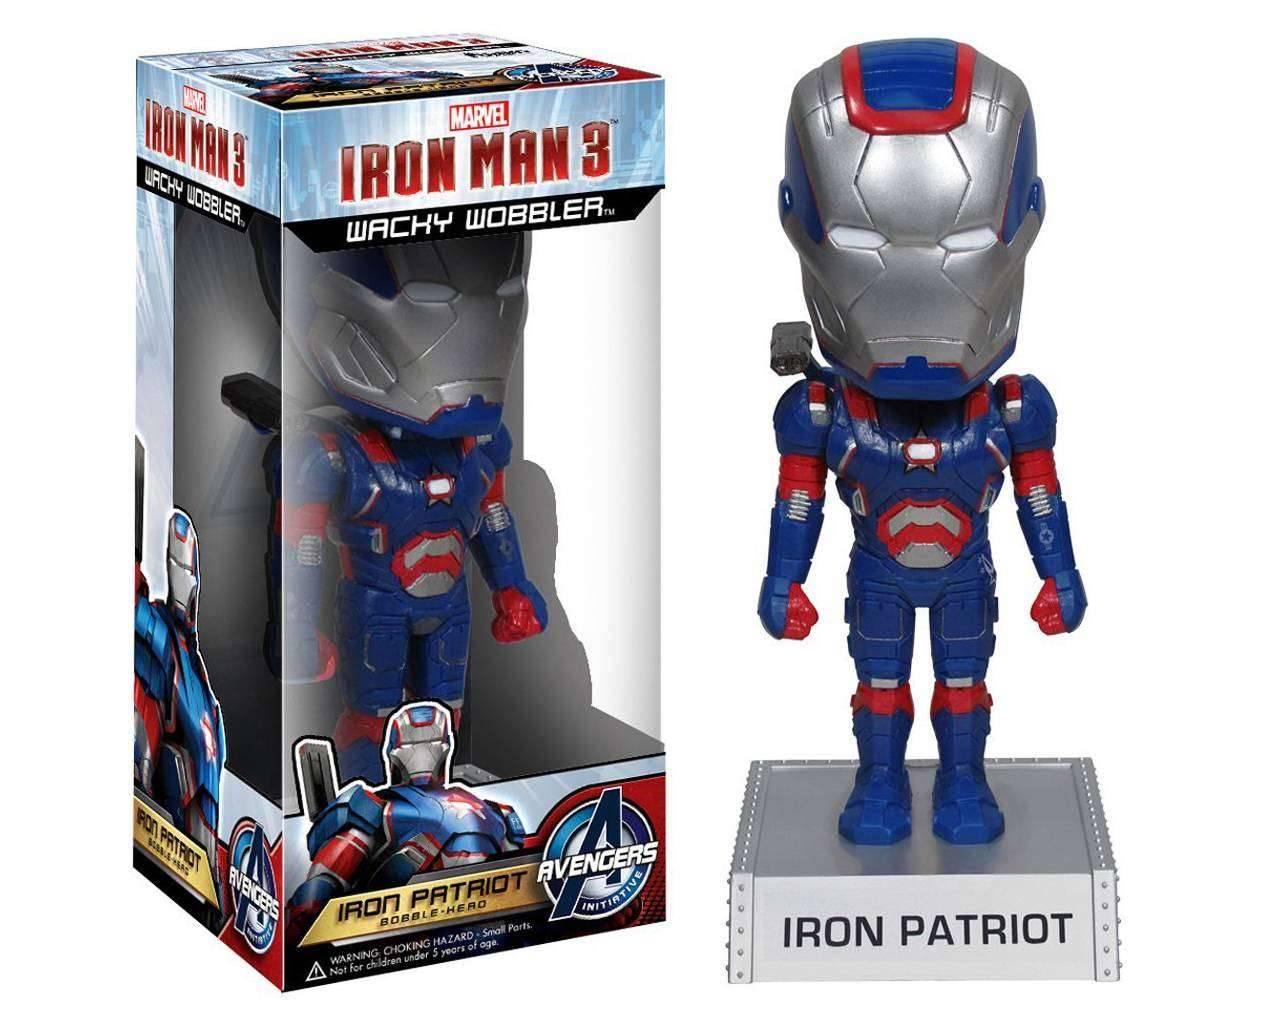 Iron Patriot Wacky Wobbler